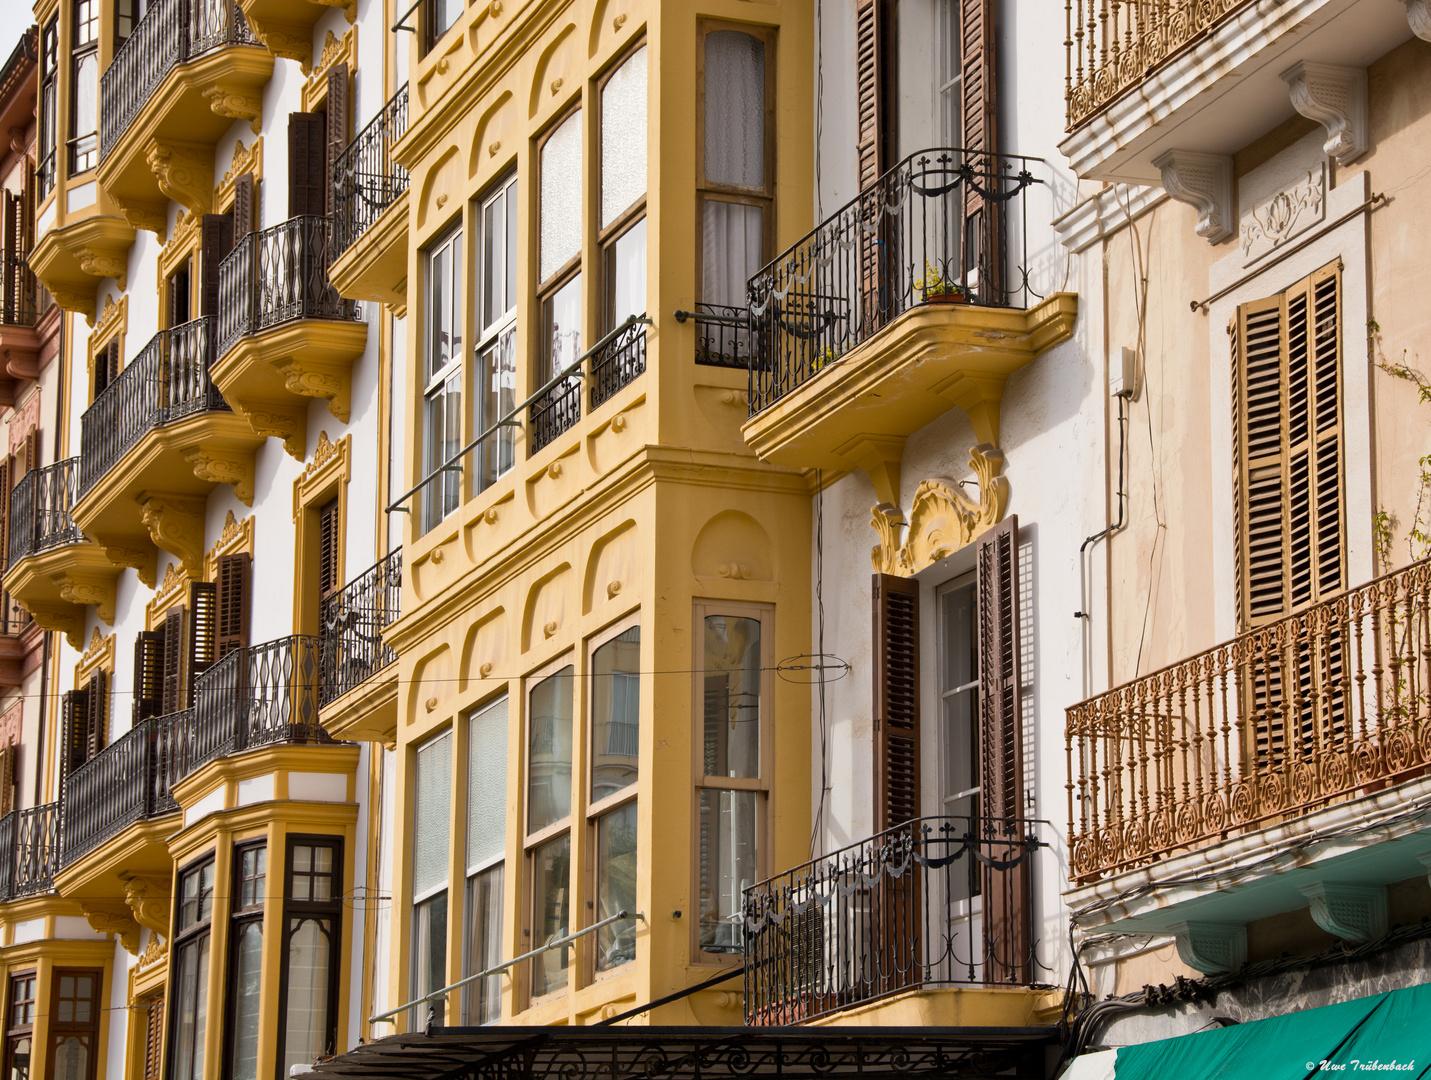 Ibiza-Architektur: Fassade am zentralen Platz Vara de Rey (3)